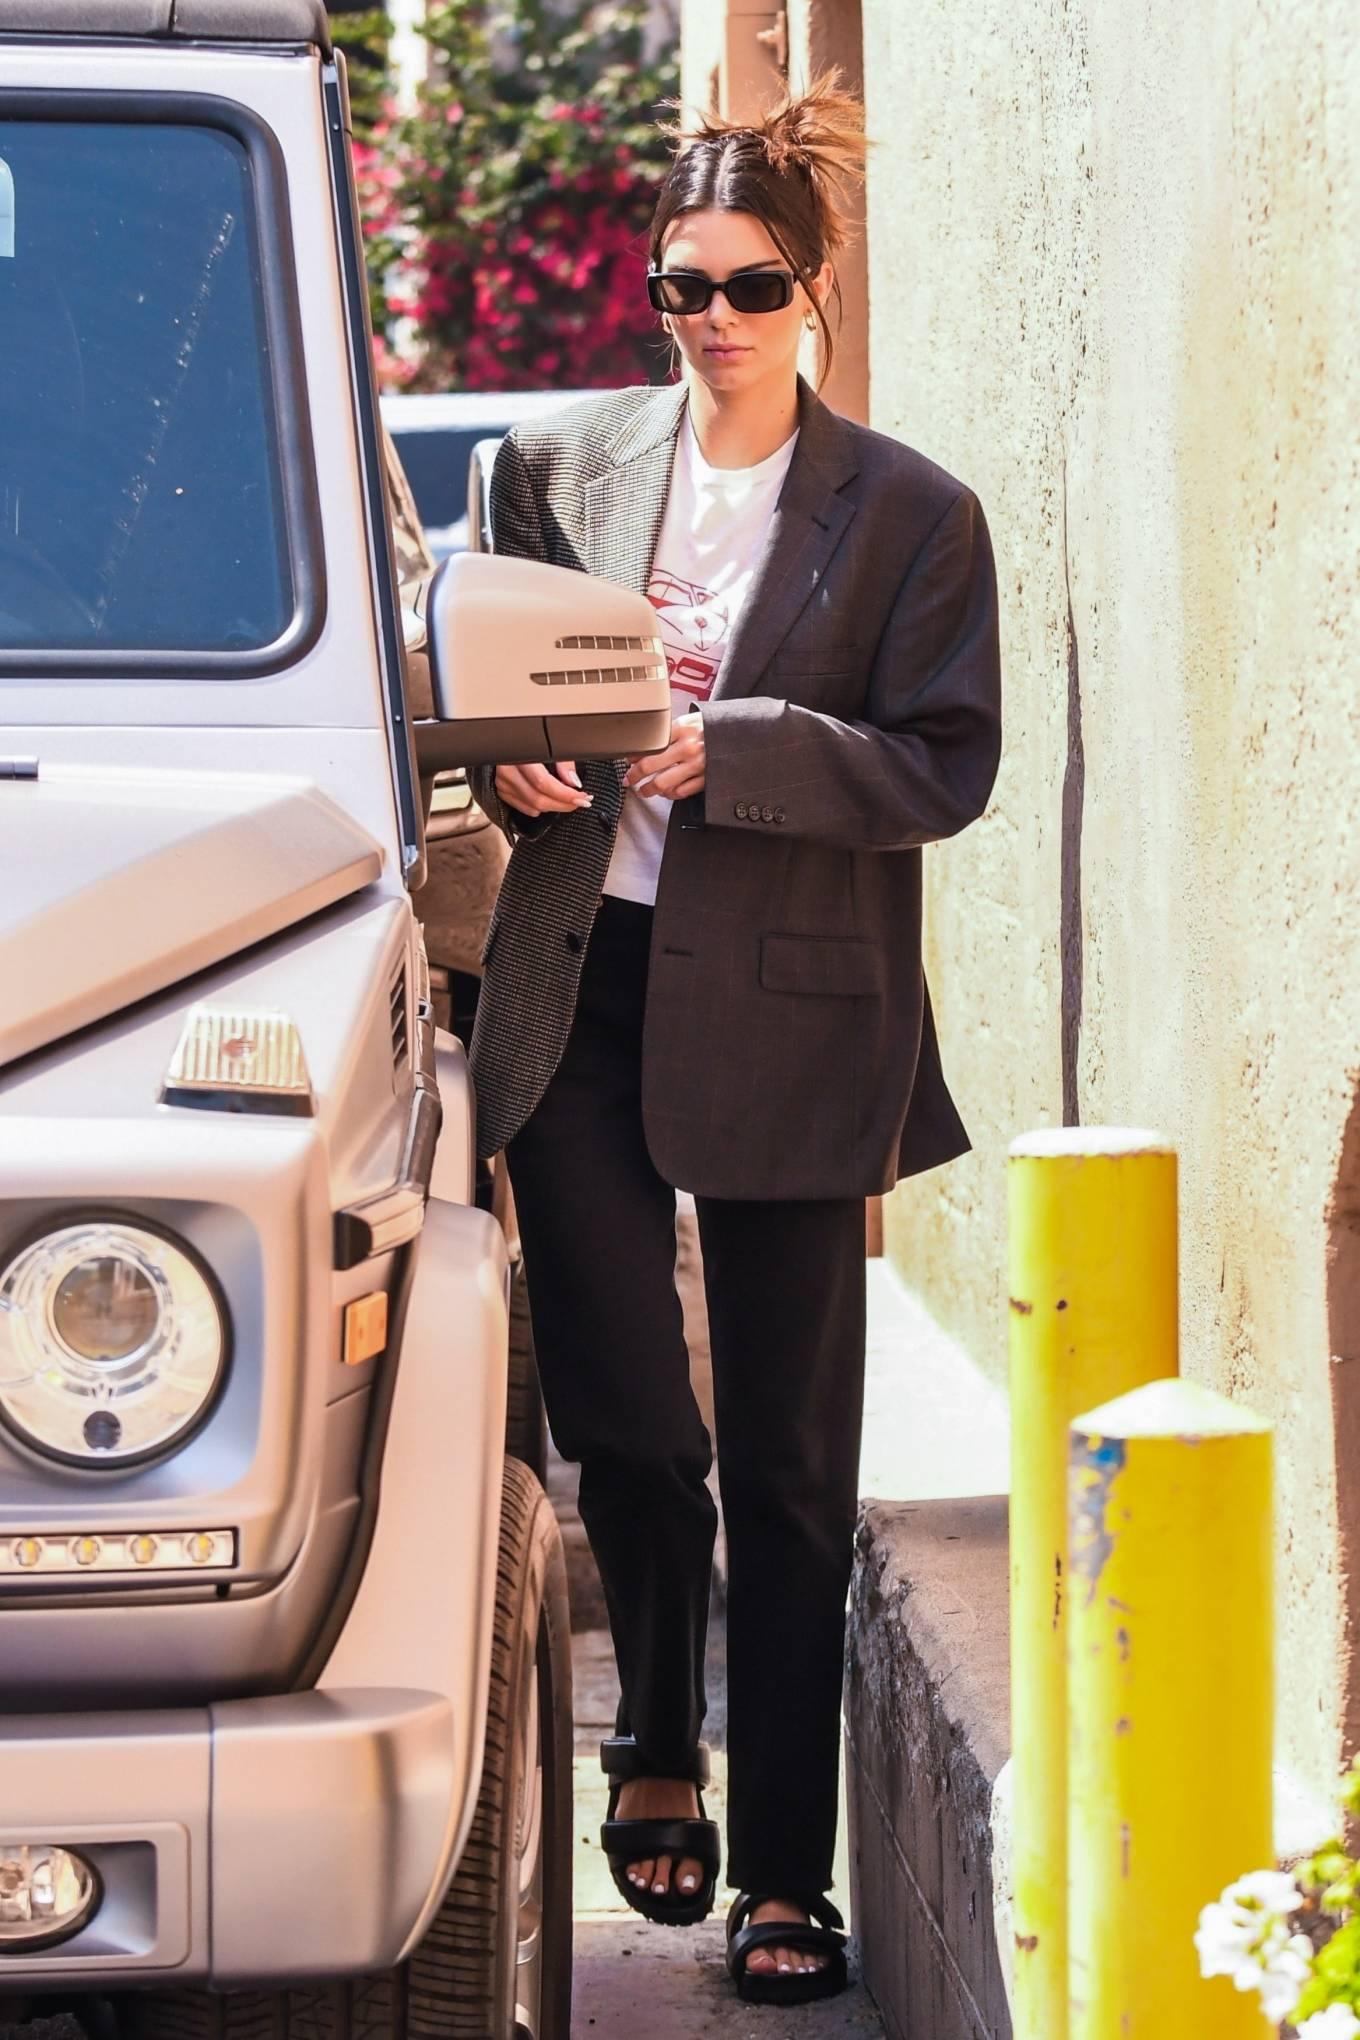 Kendall Jenner, brown mules, baltini mules, oversized metallic grey blazer, black Bottega Veneta shoulder bag, round, two-strap, flat heel, white top, black sunglasses, grey pants. Kendall Jenner rocking round brown two-strap mules by baltini with flat heel